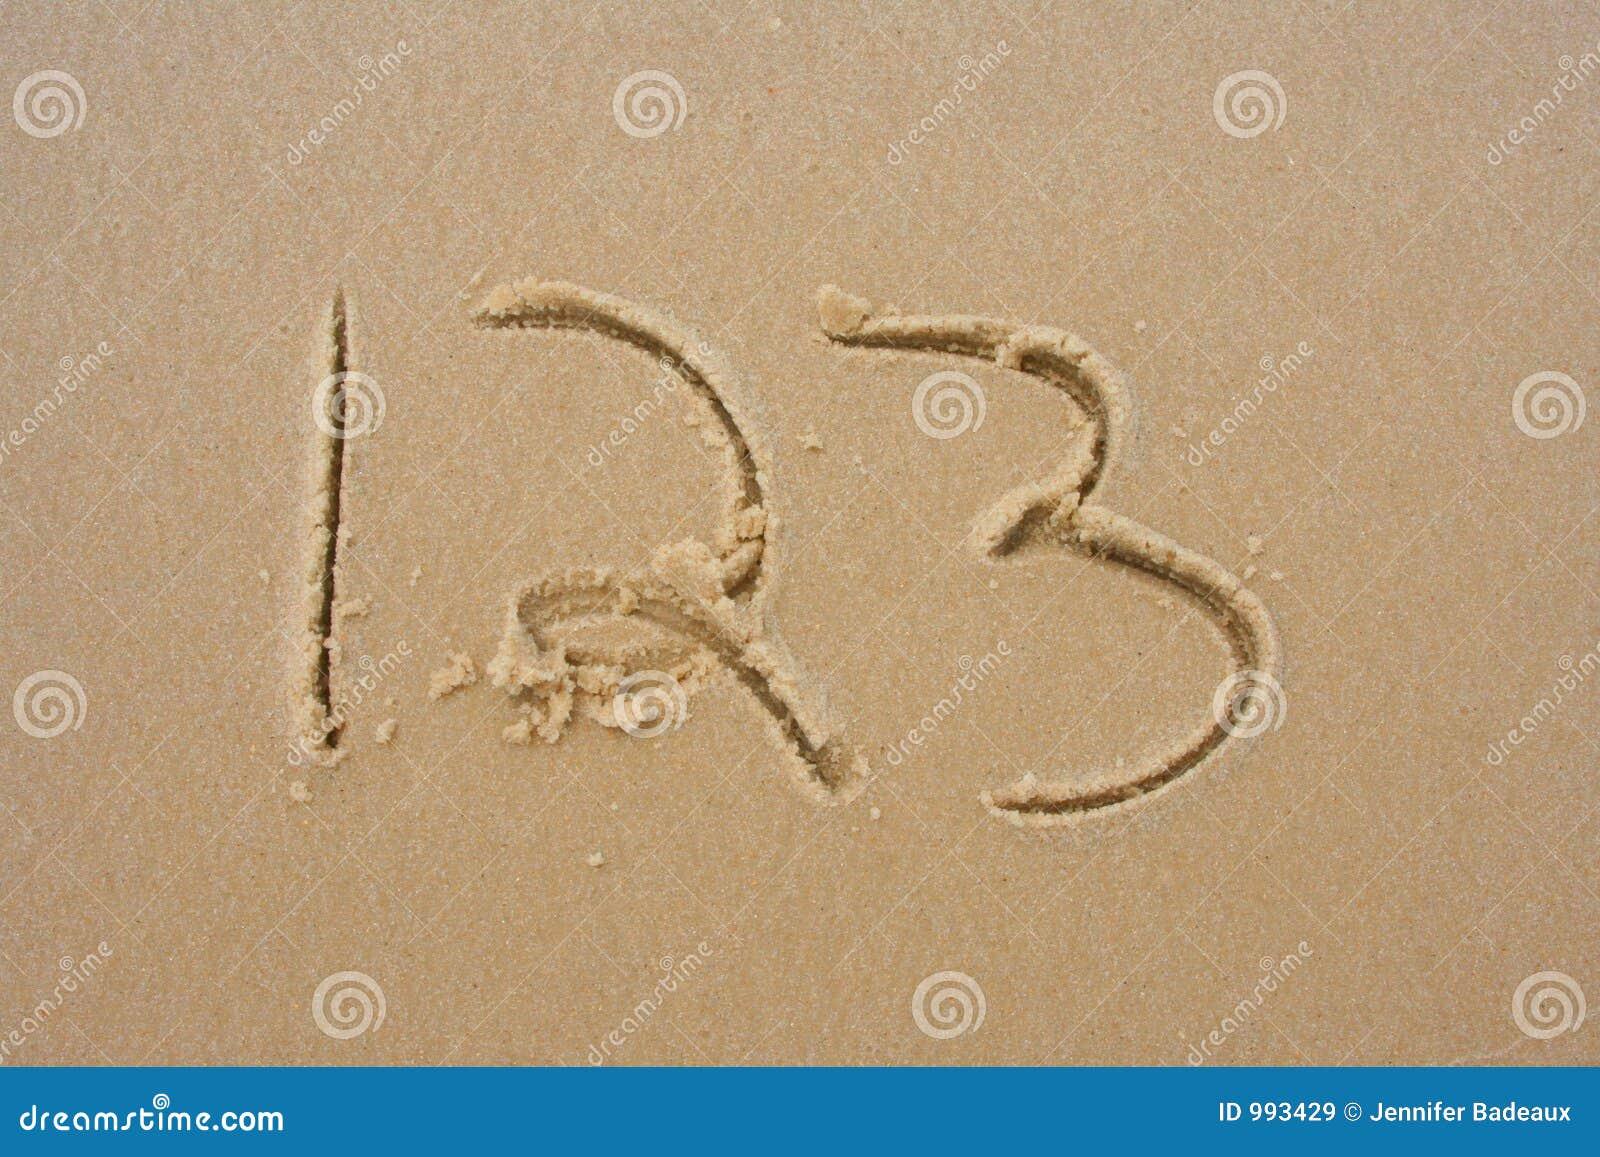 1 sand 2 3